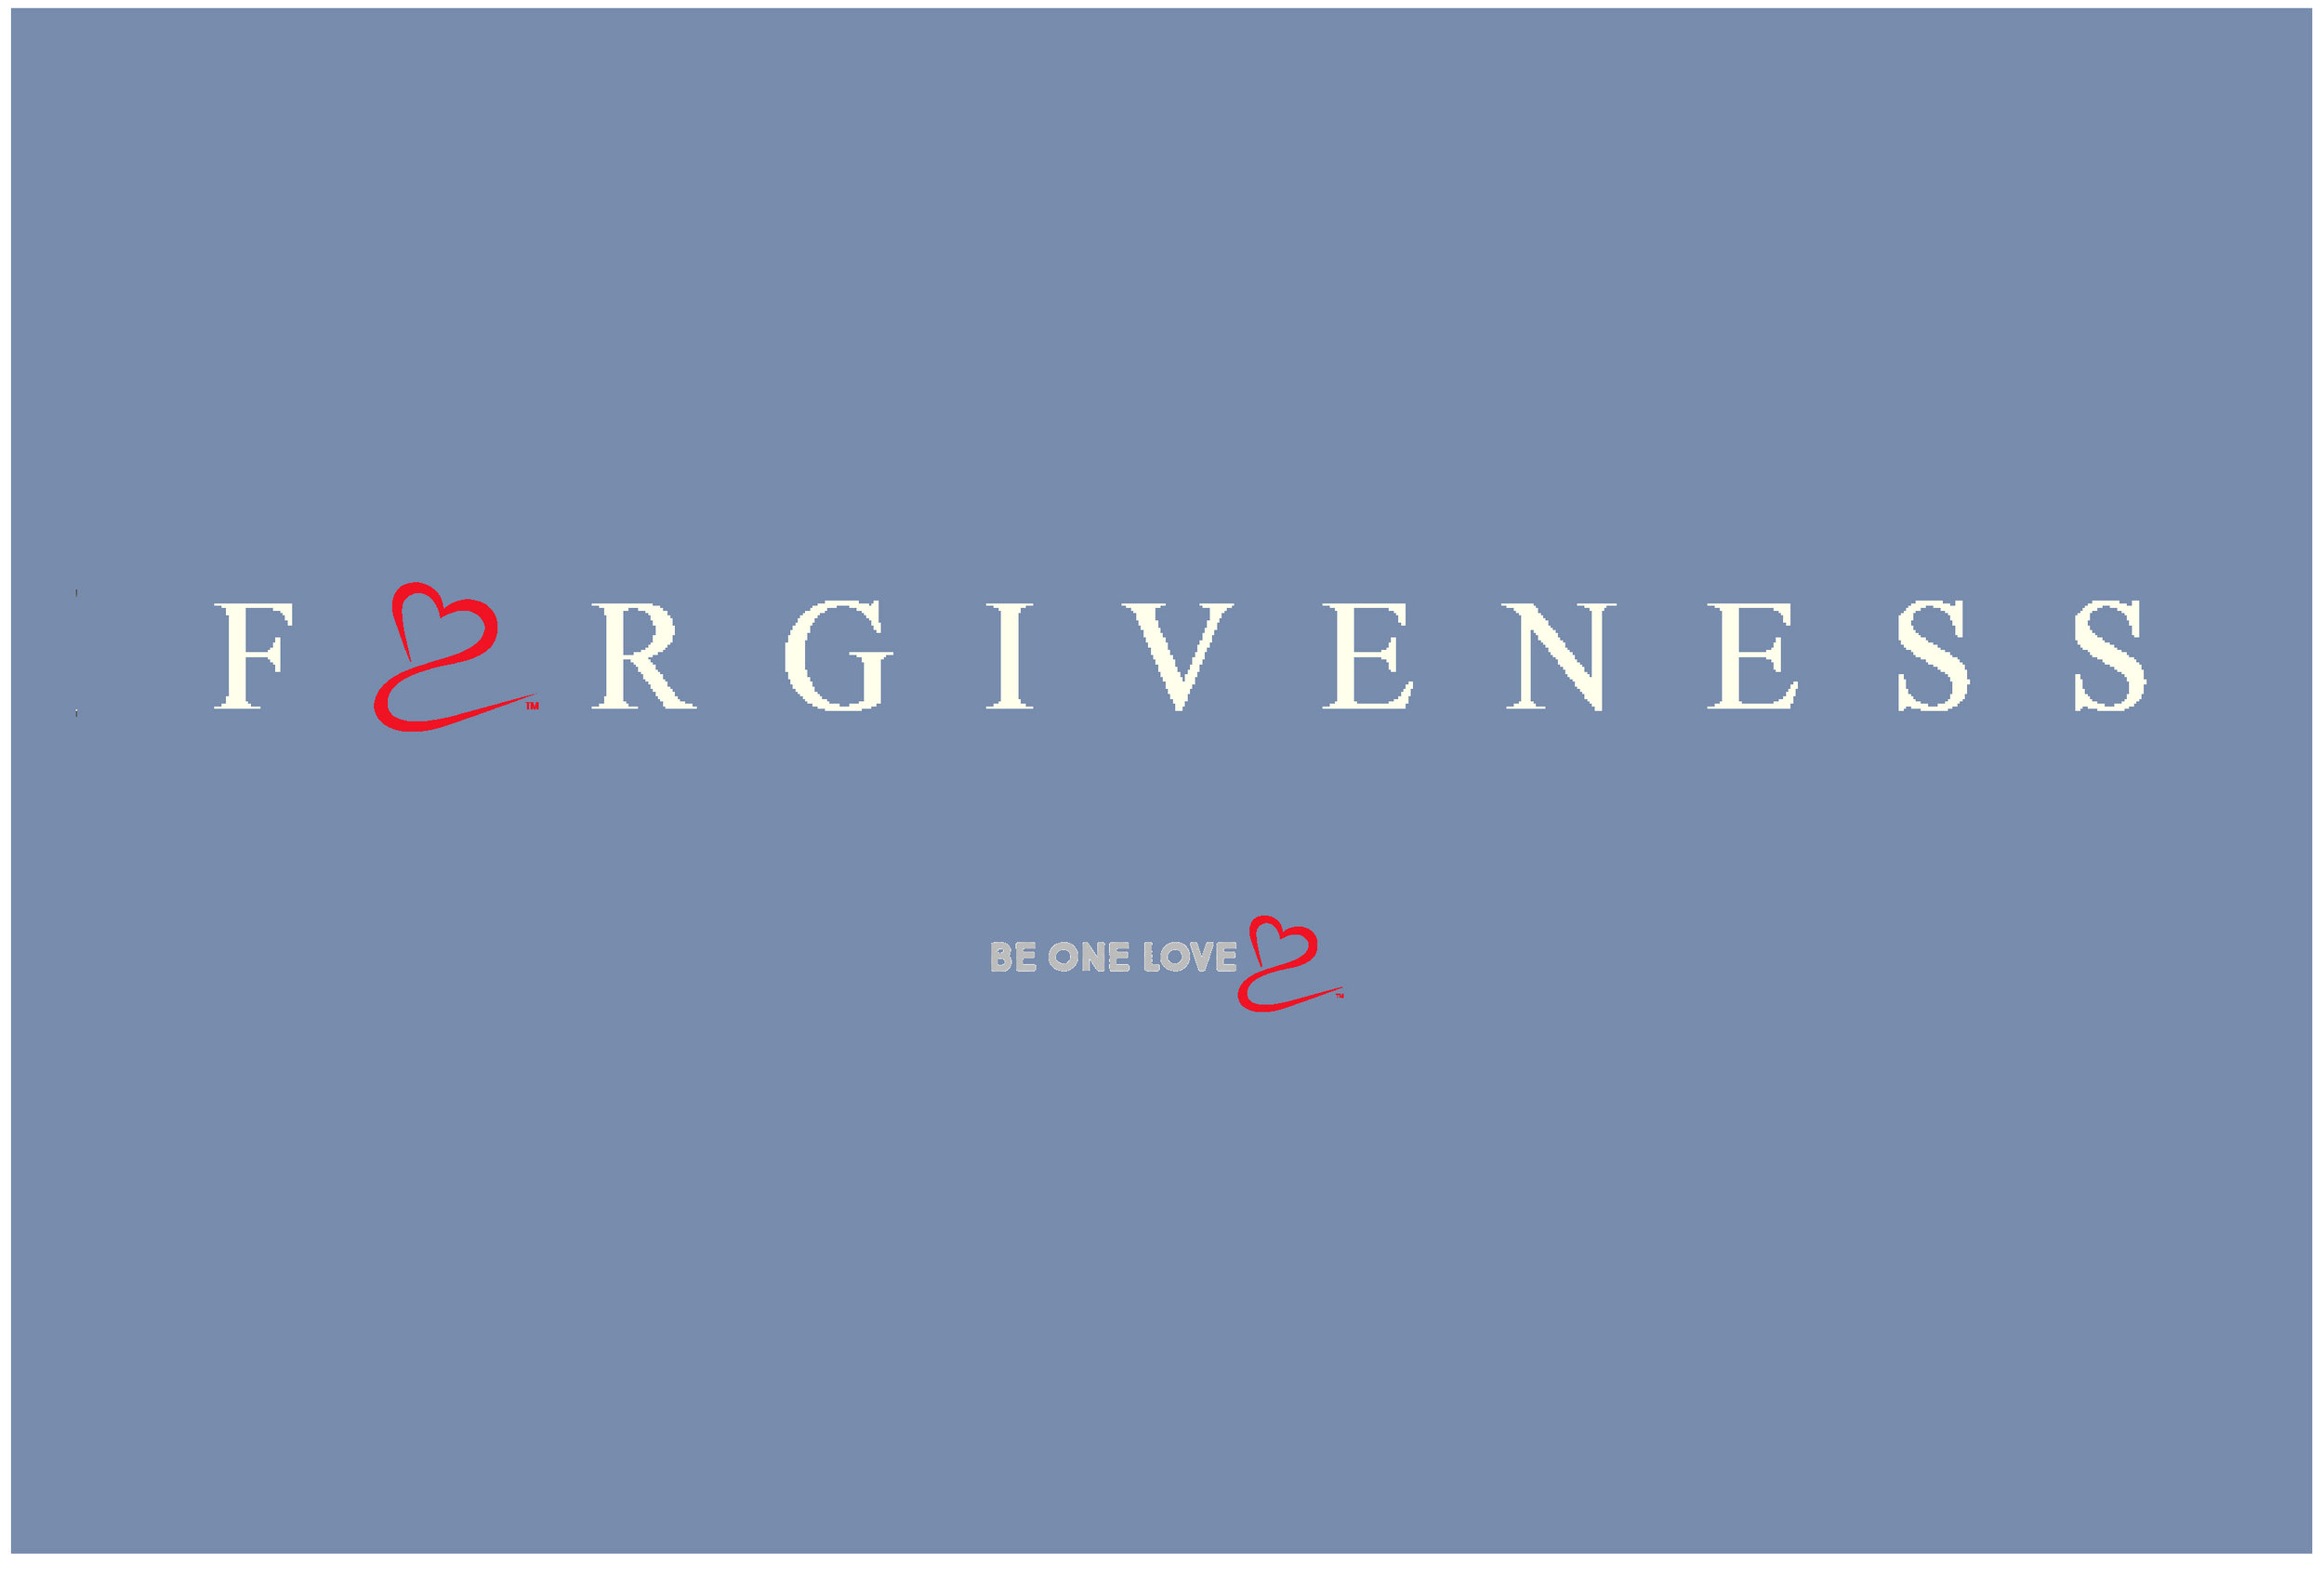 FORGIVENESS_2.jpg